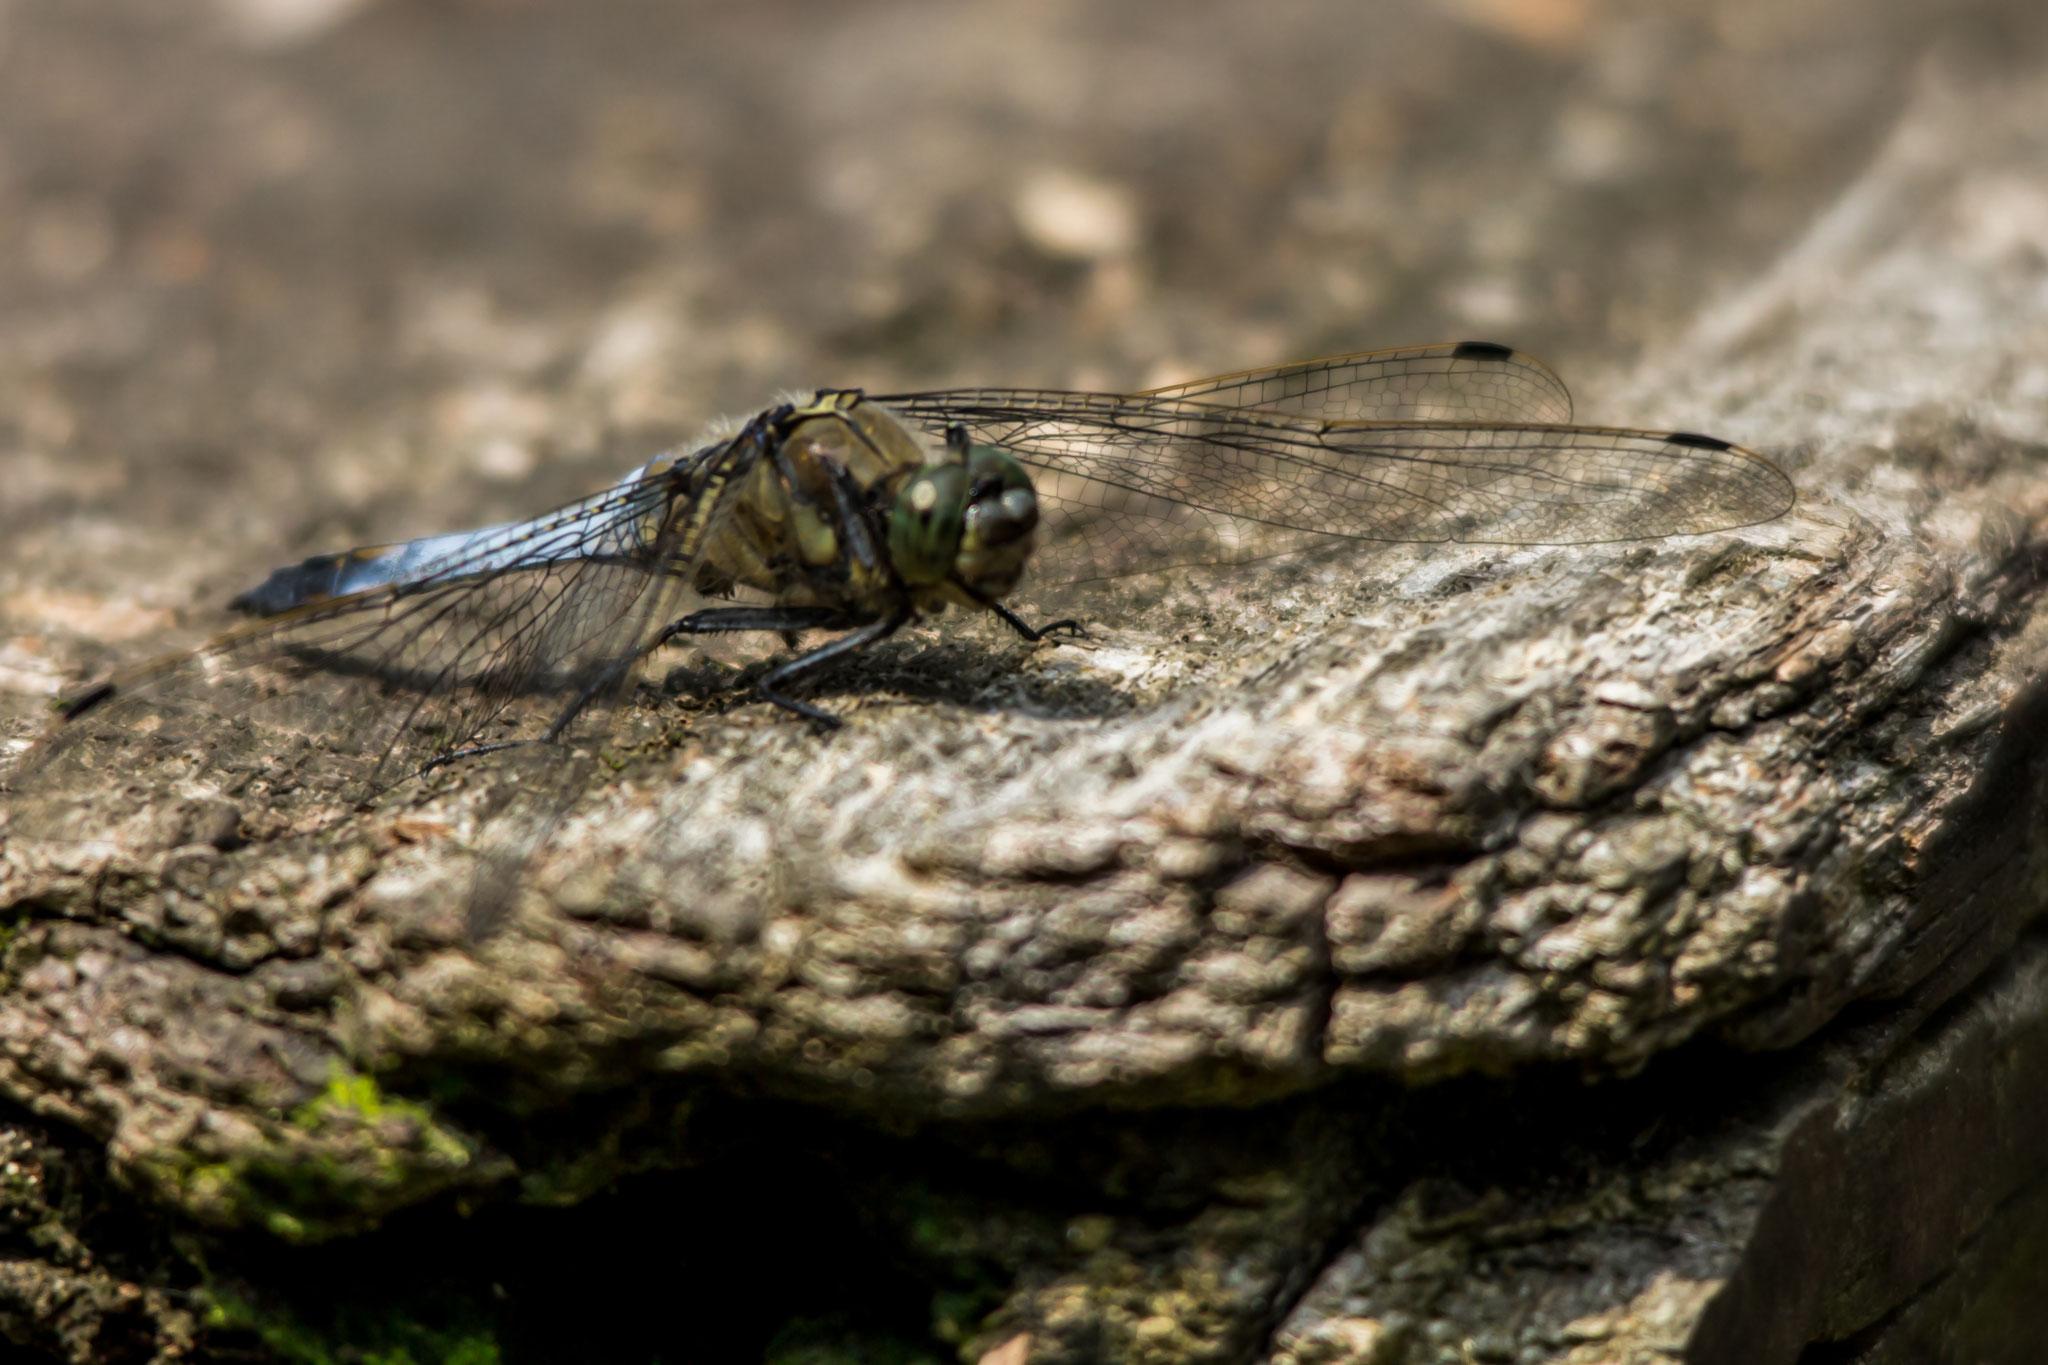 24_Libelle im Naturschutzgebiet Mönchbruch.